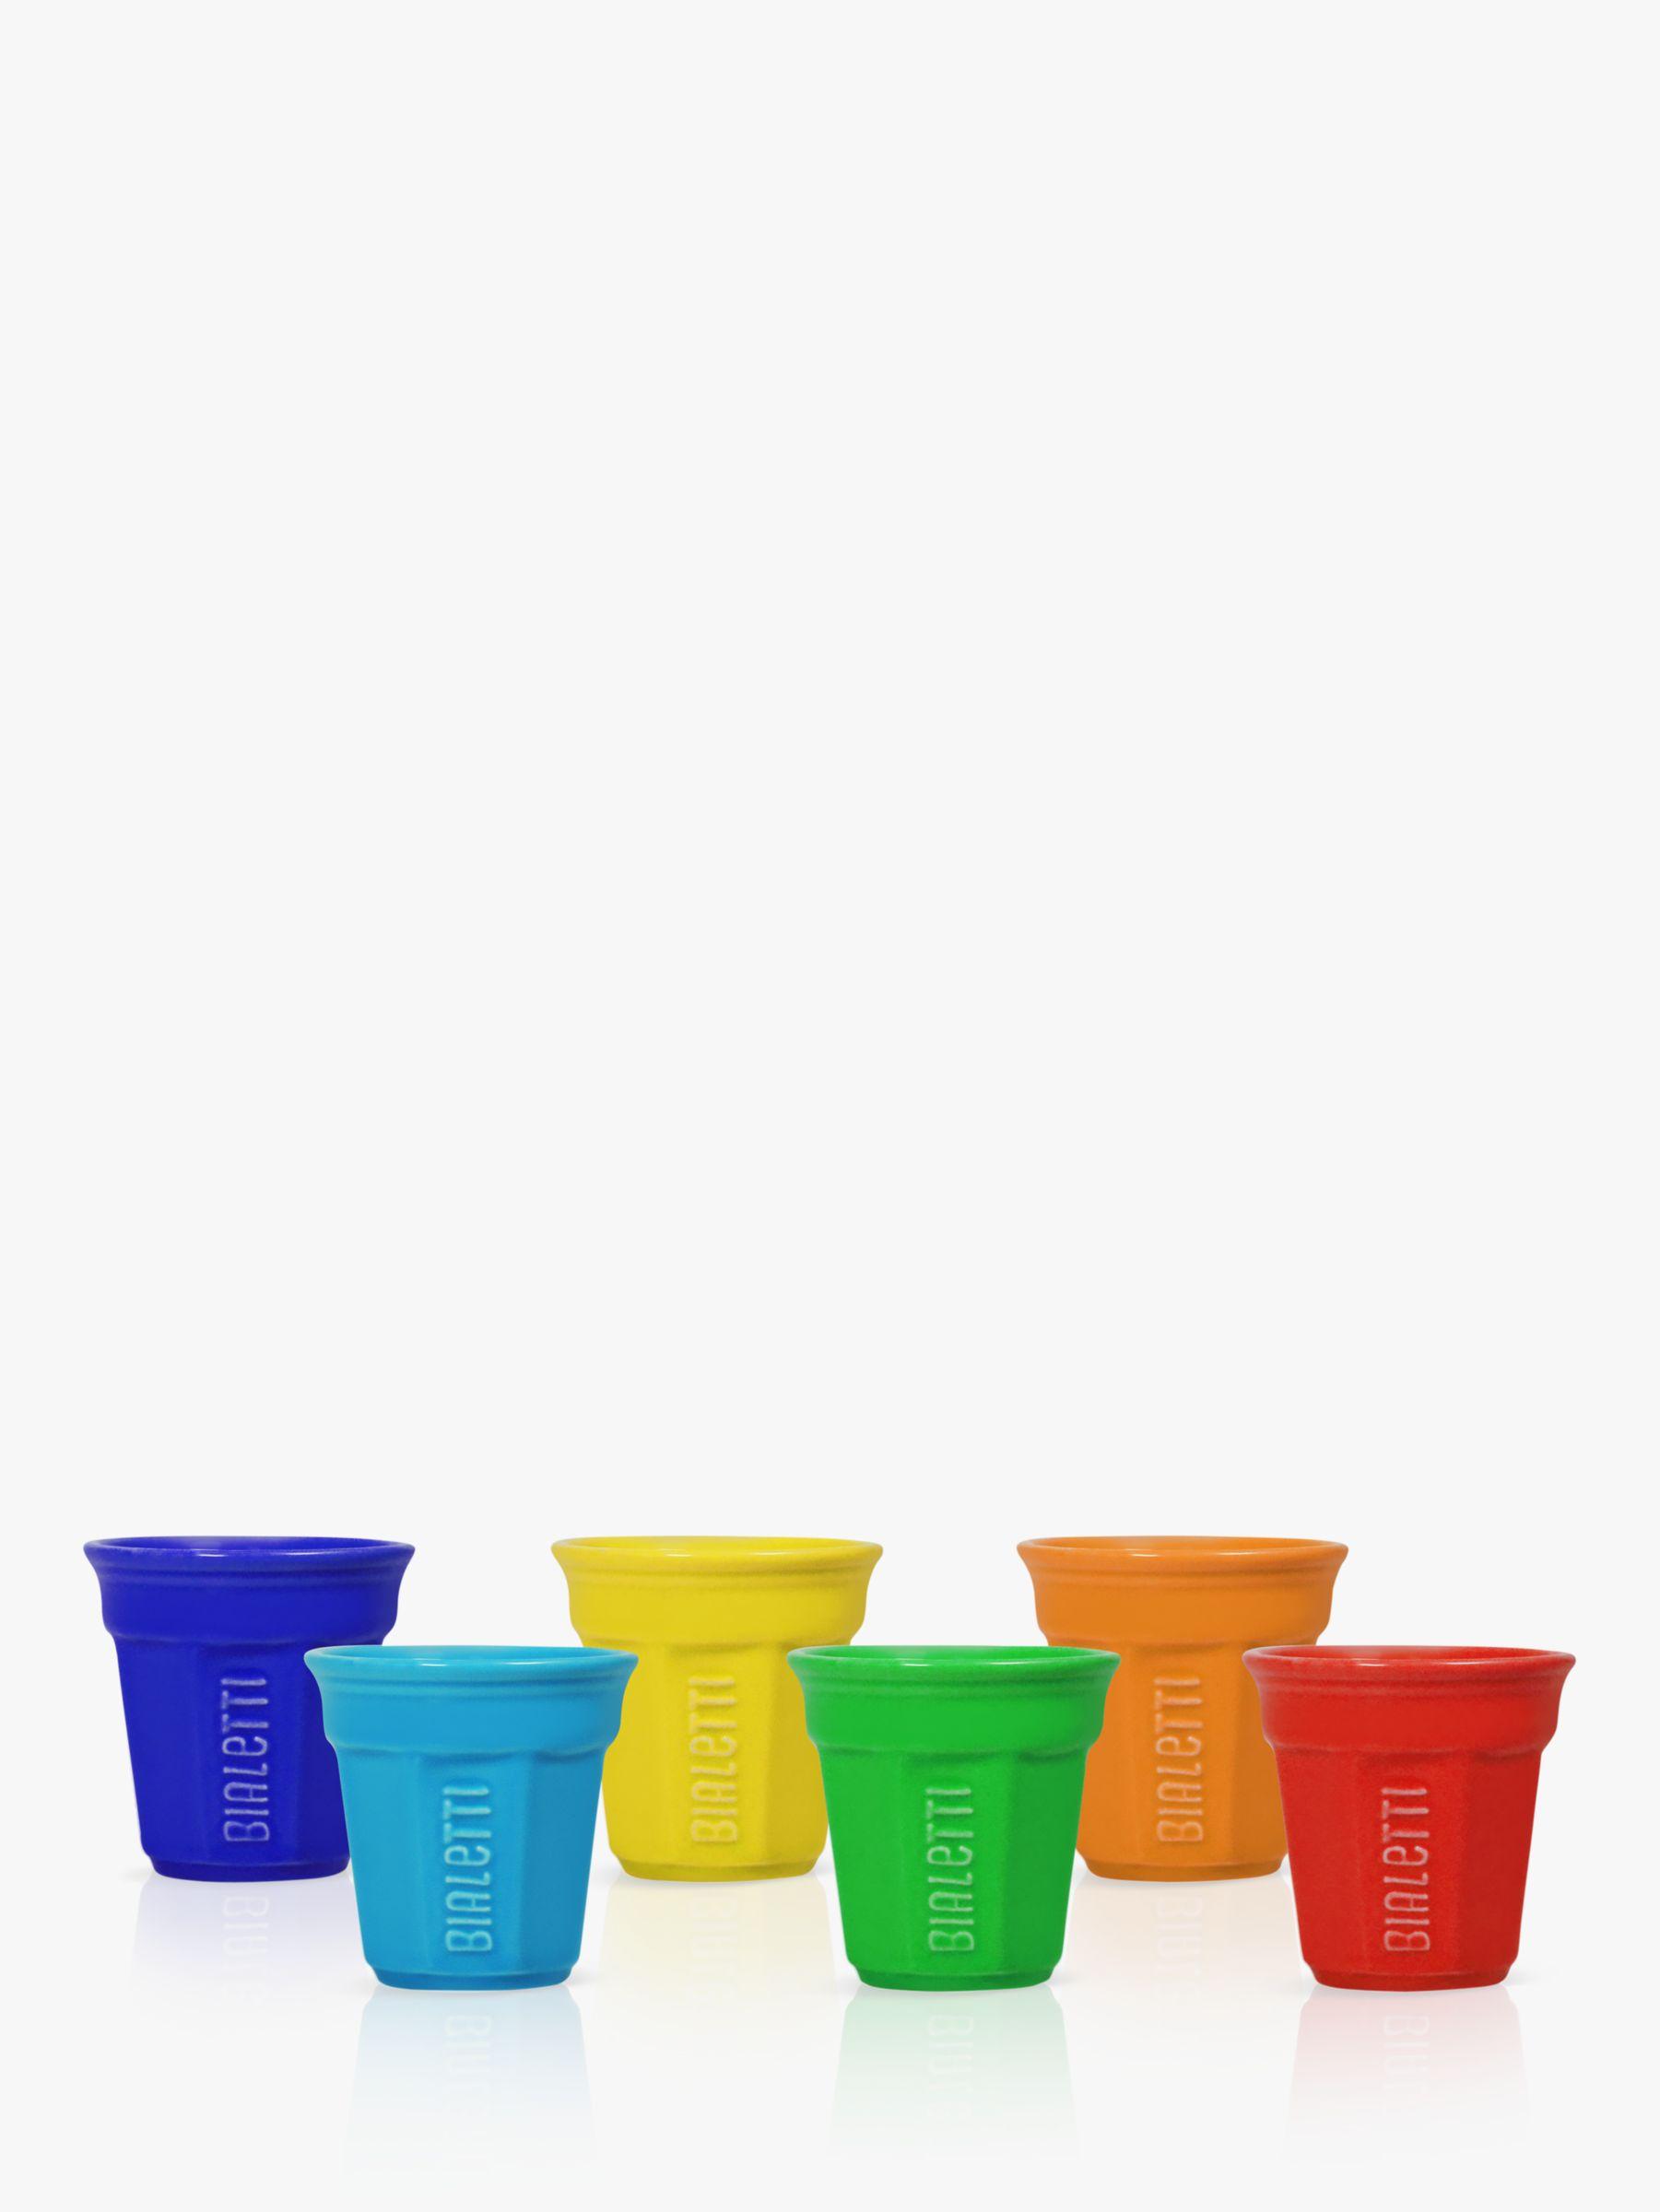 Bialetti Bialetti Espresso Cups, Set of 6, Multi